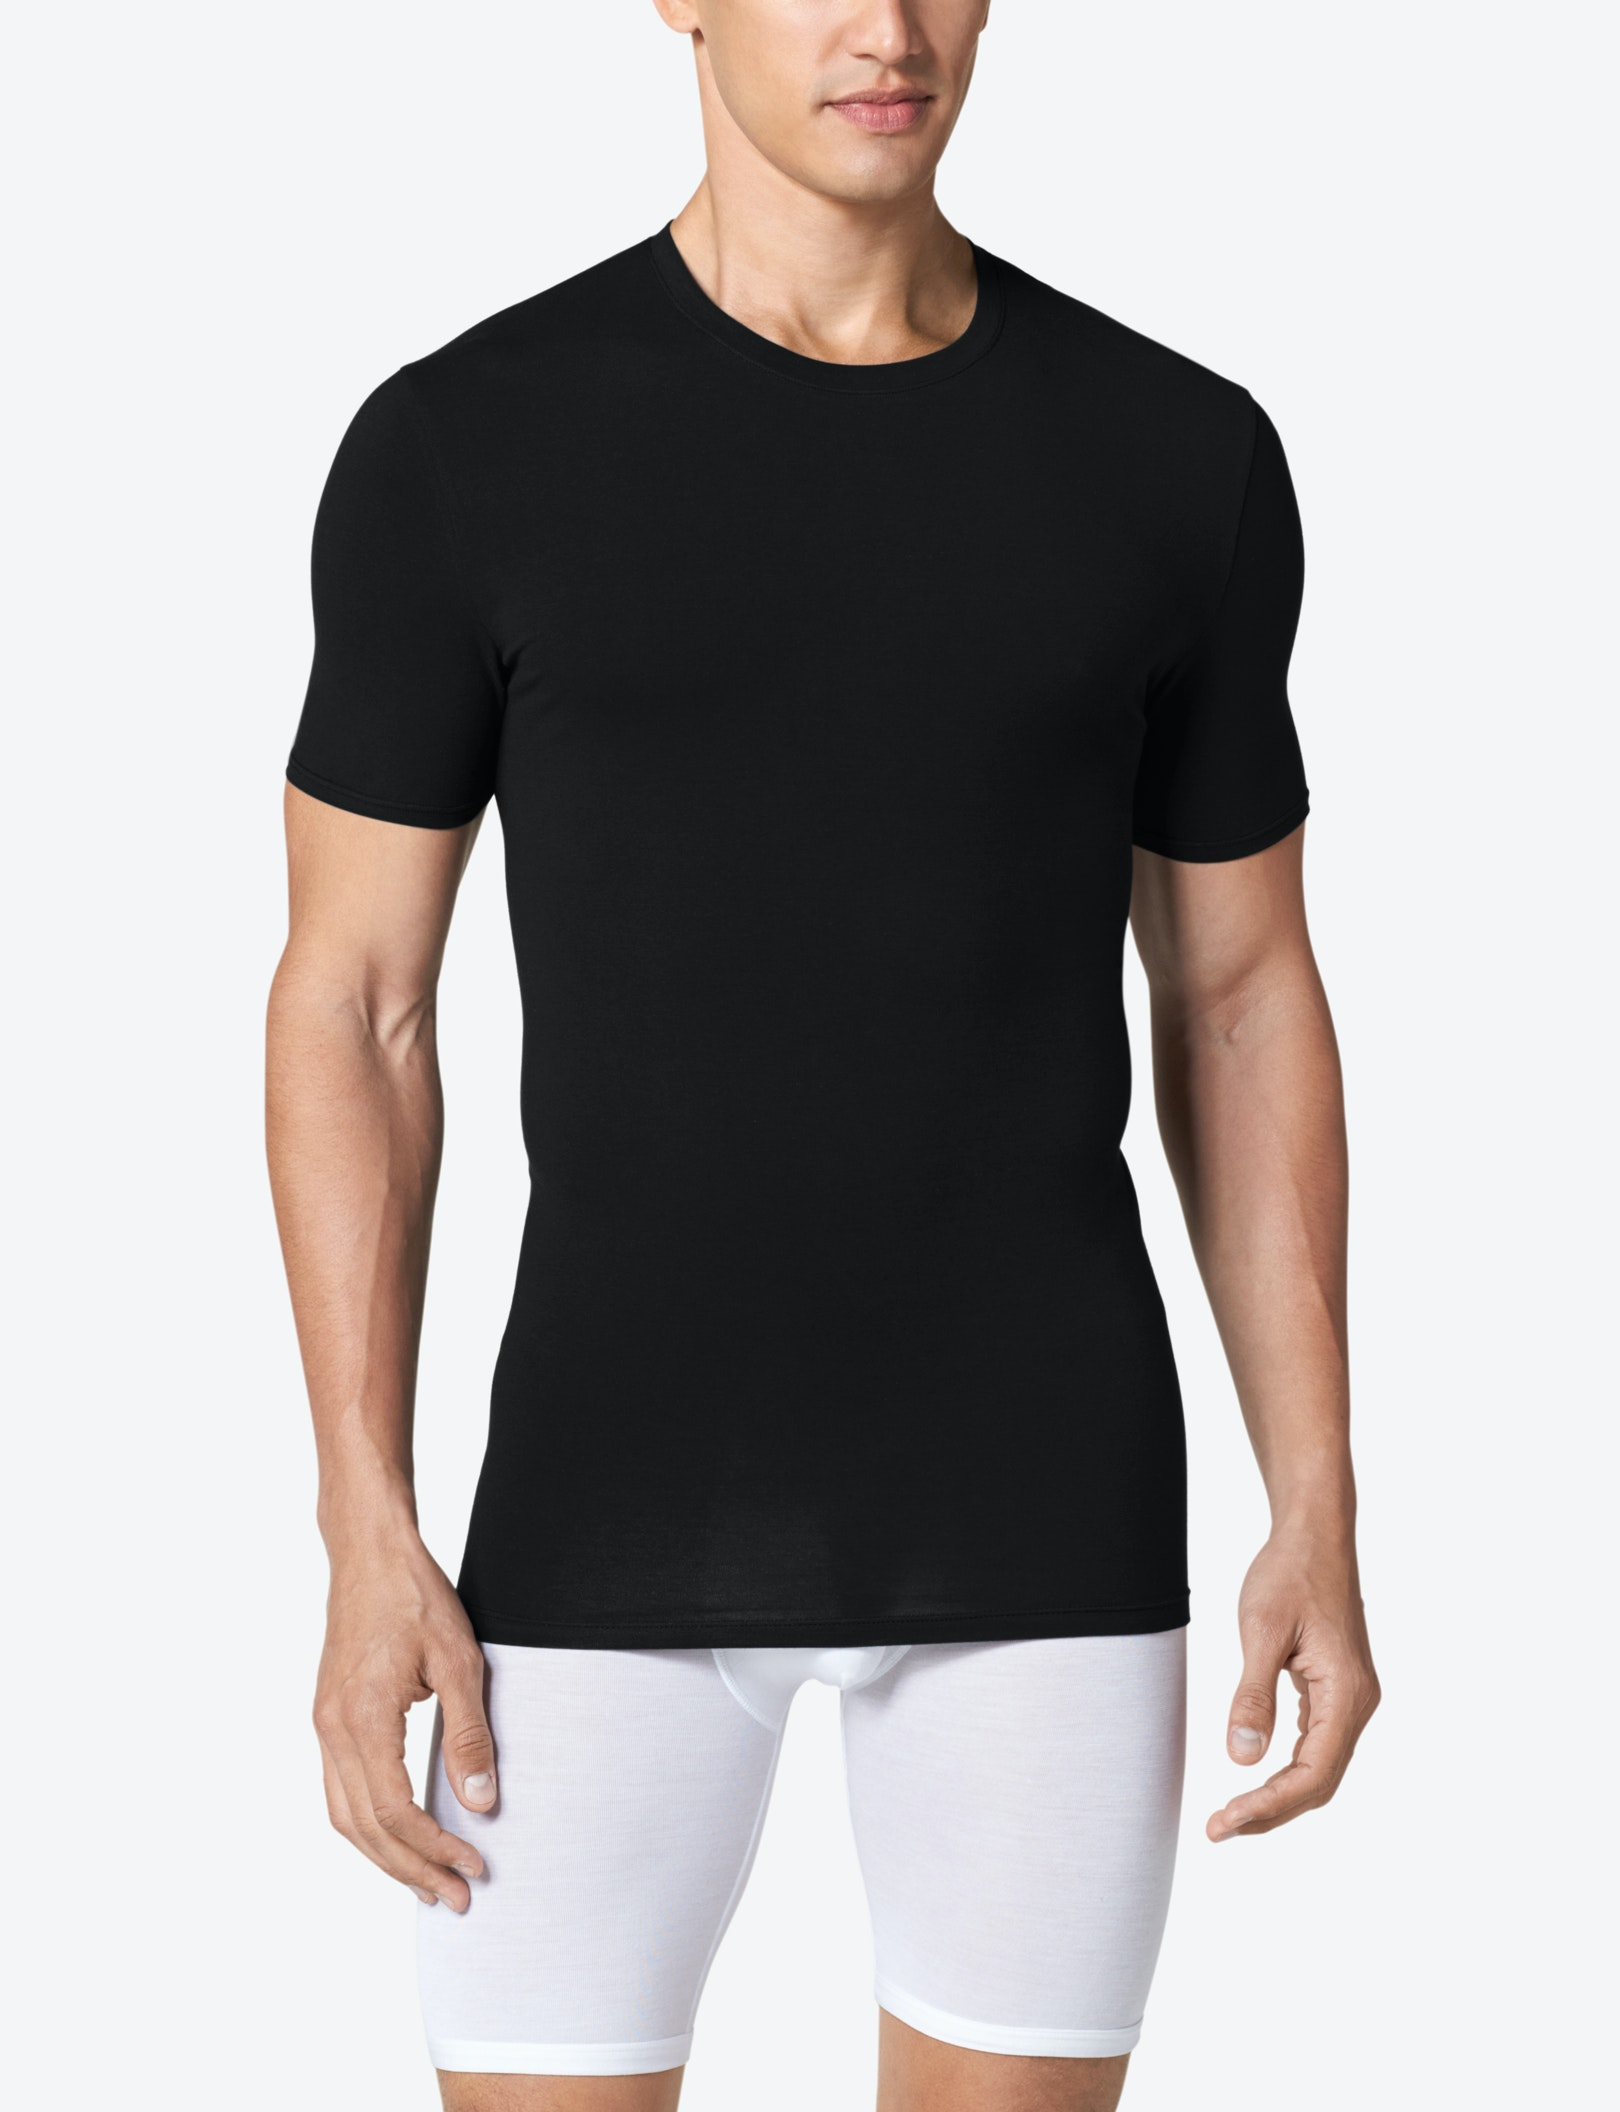 Premium Mens Undershirts And Underwear By Tommy John